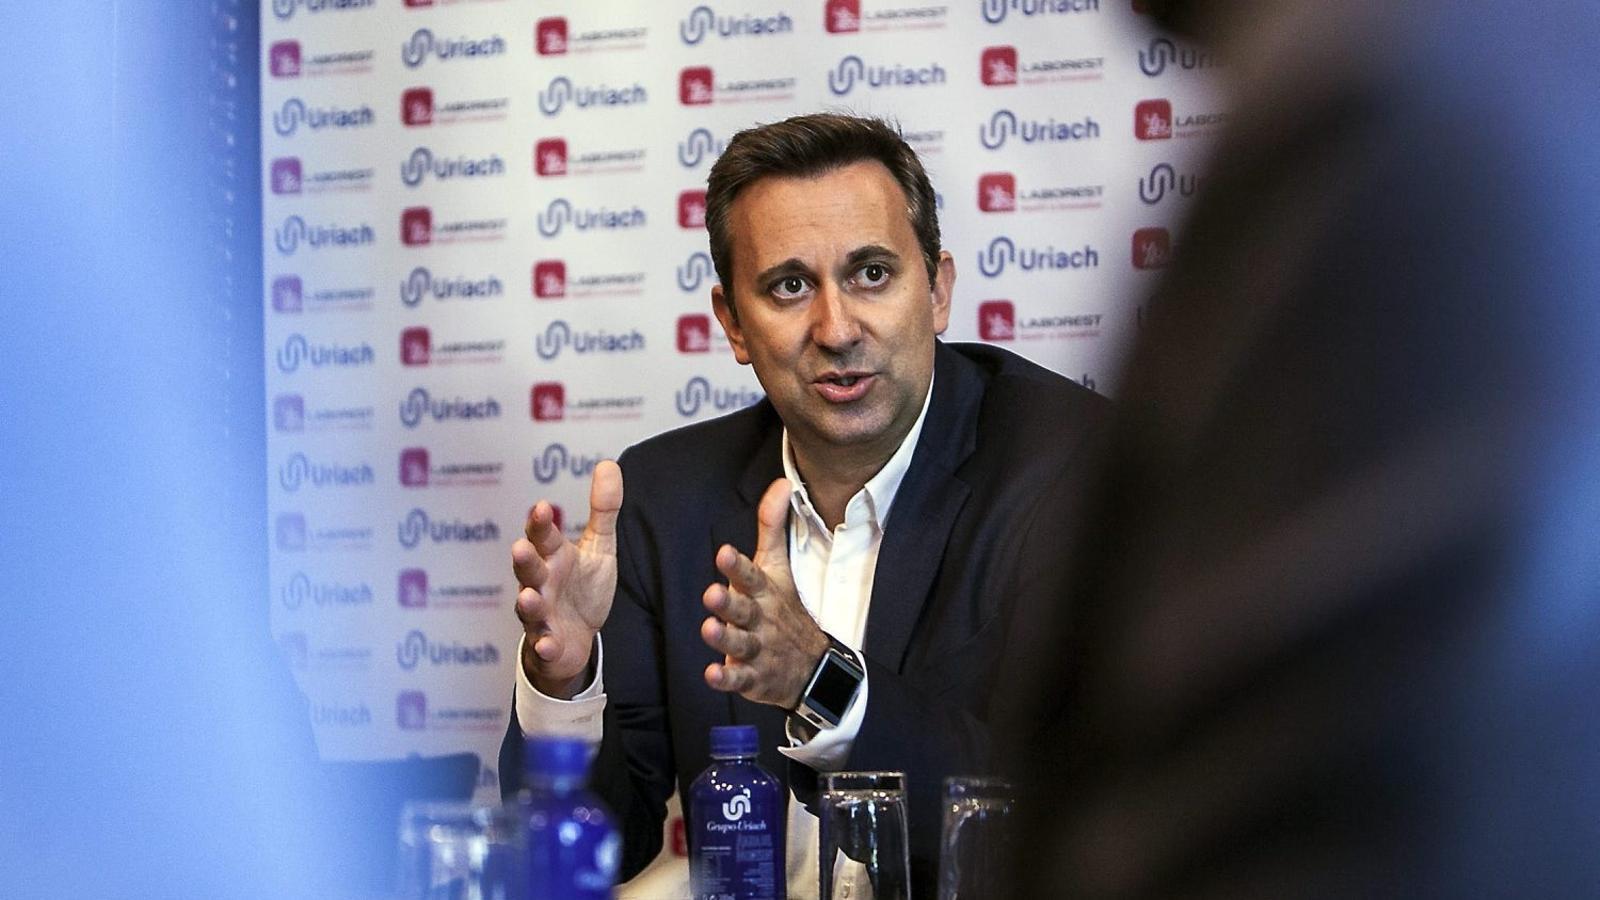 Uriach augmenta vendes un 16% i compra una empresa a Portugal